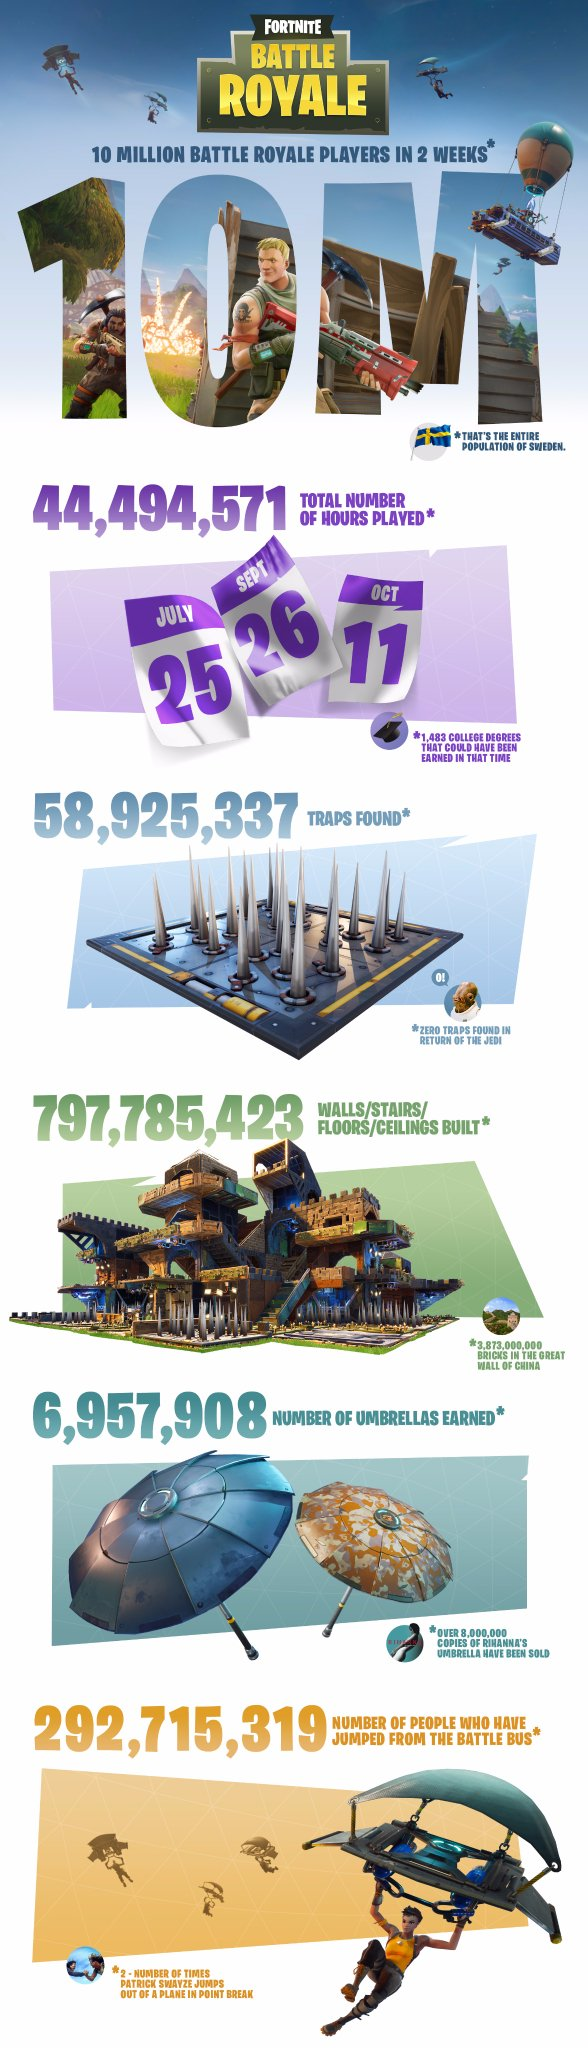 fortnite 10 million players